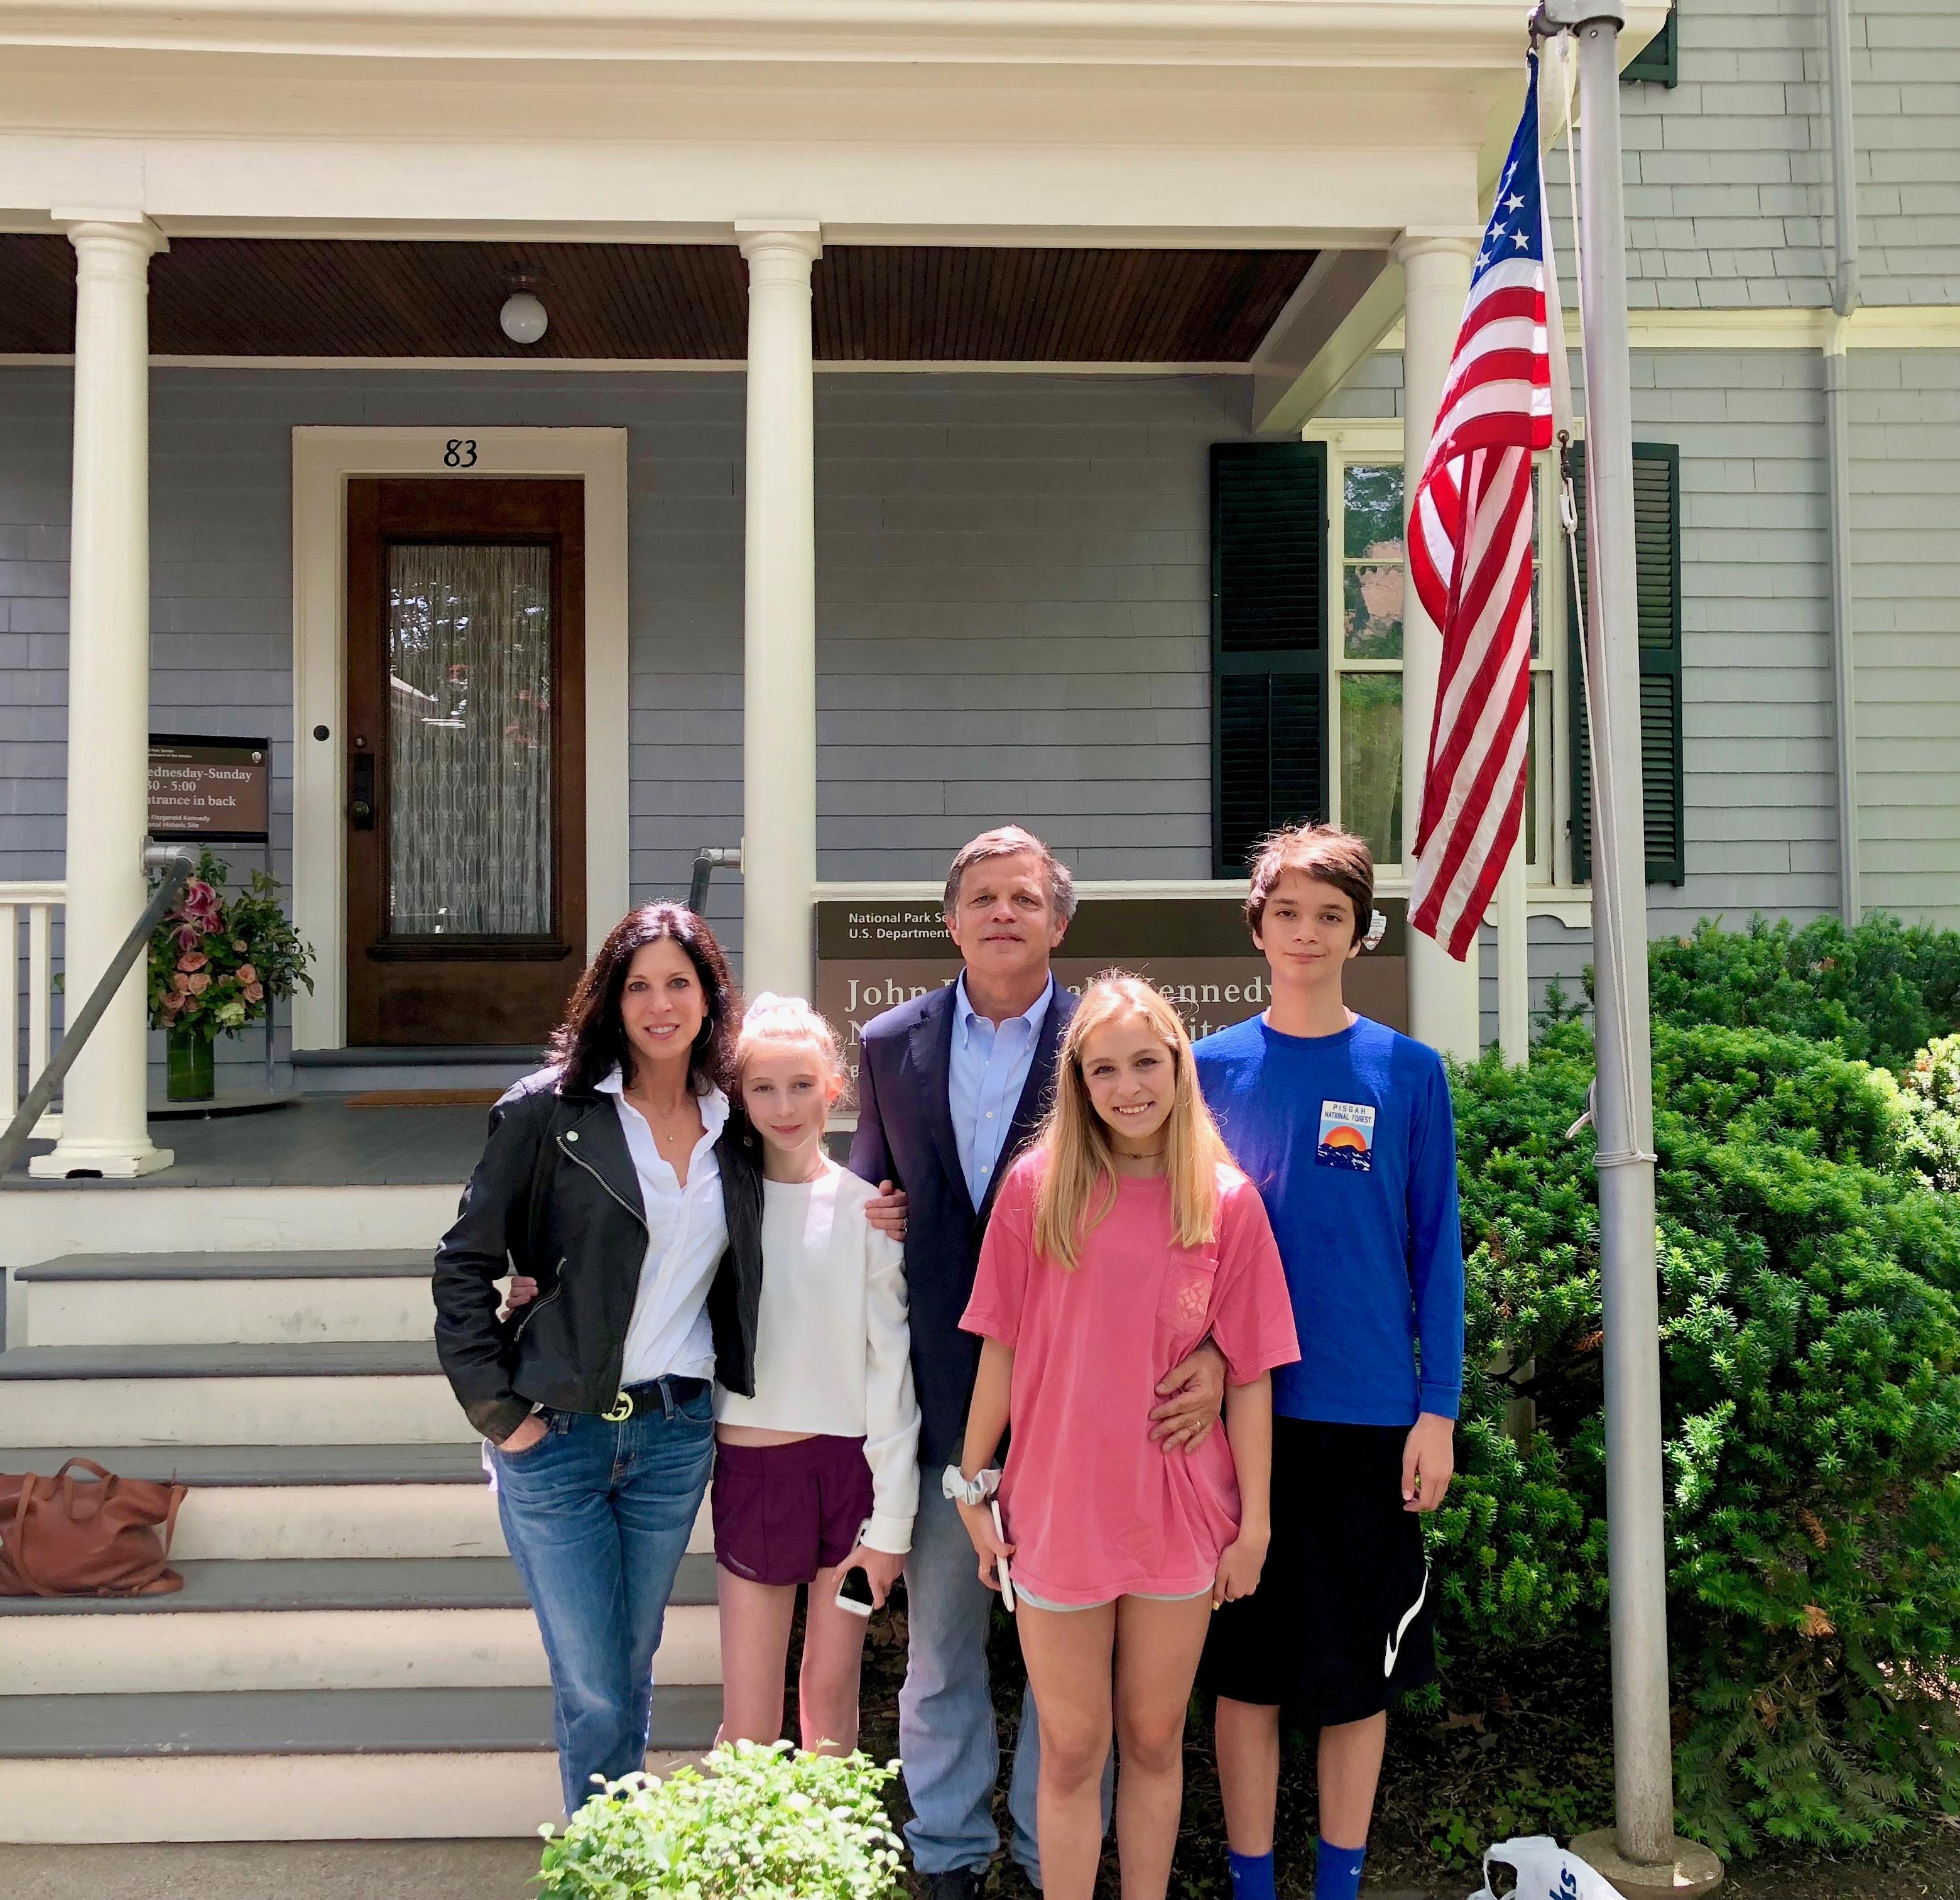 Doug Brinkley and family at John Muir house